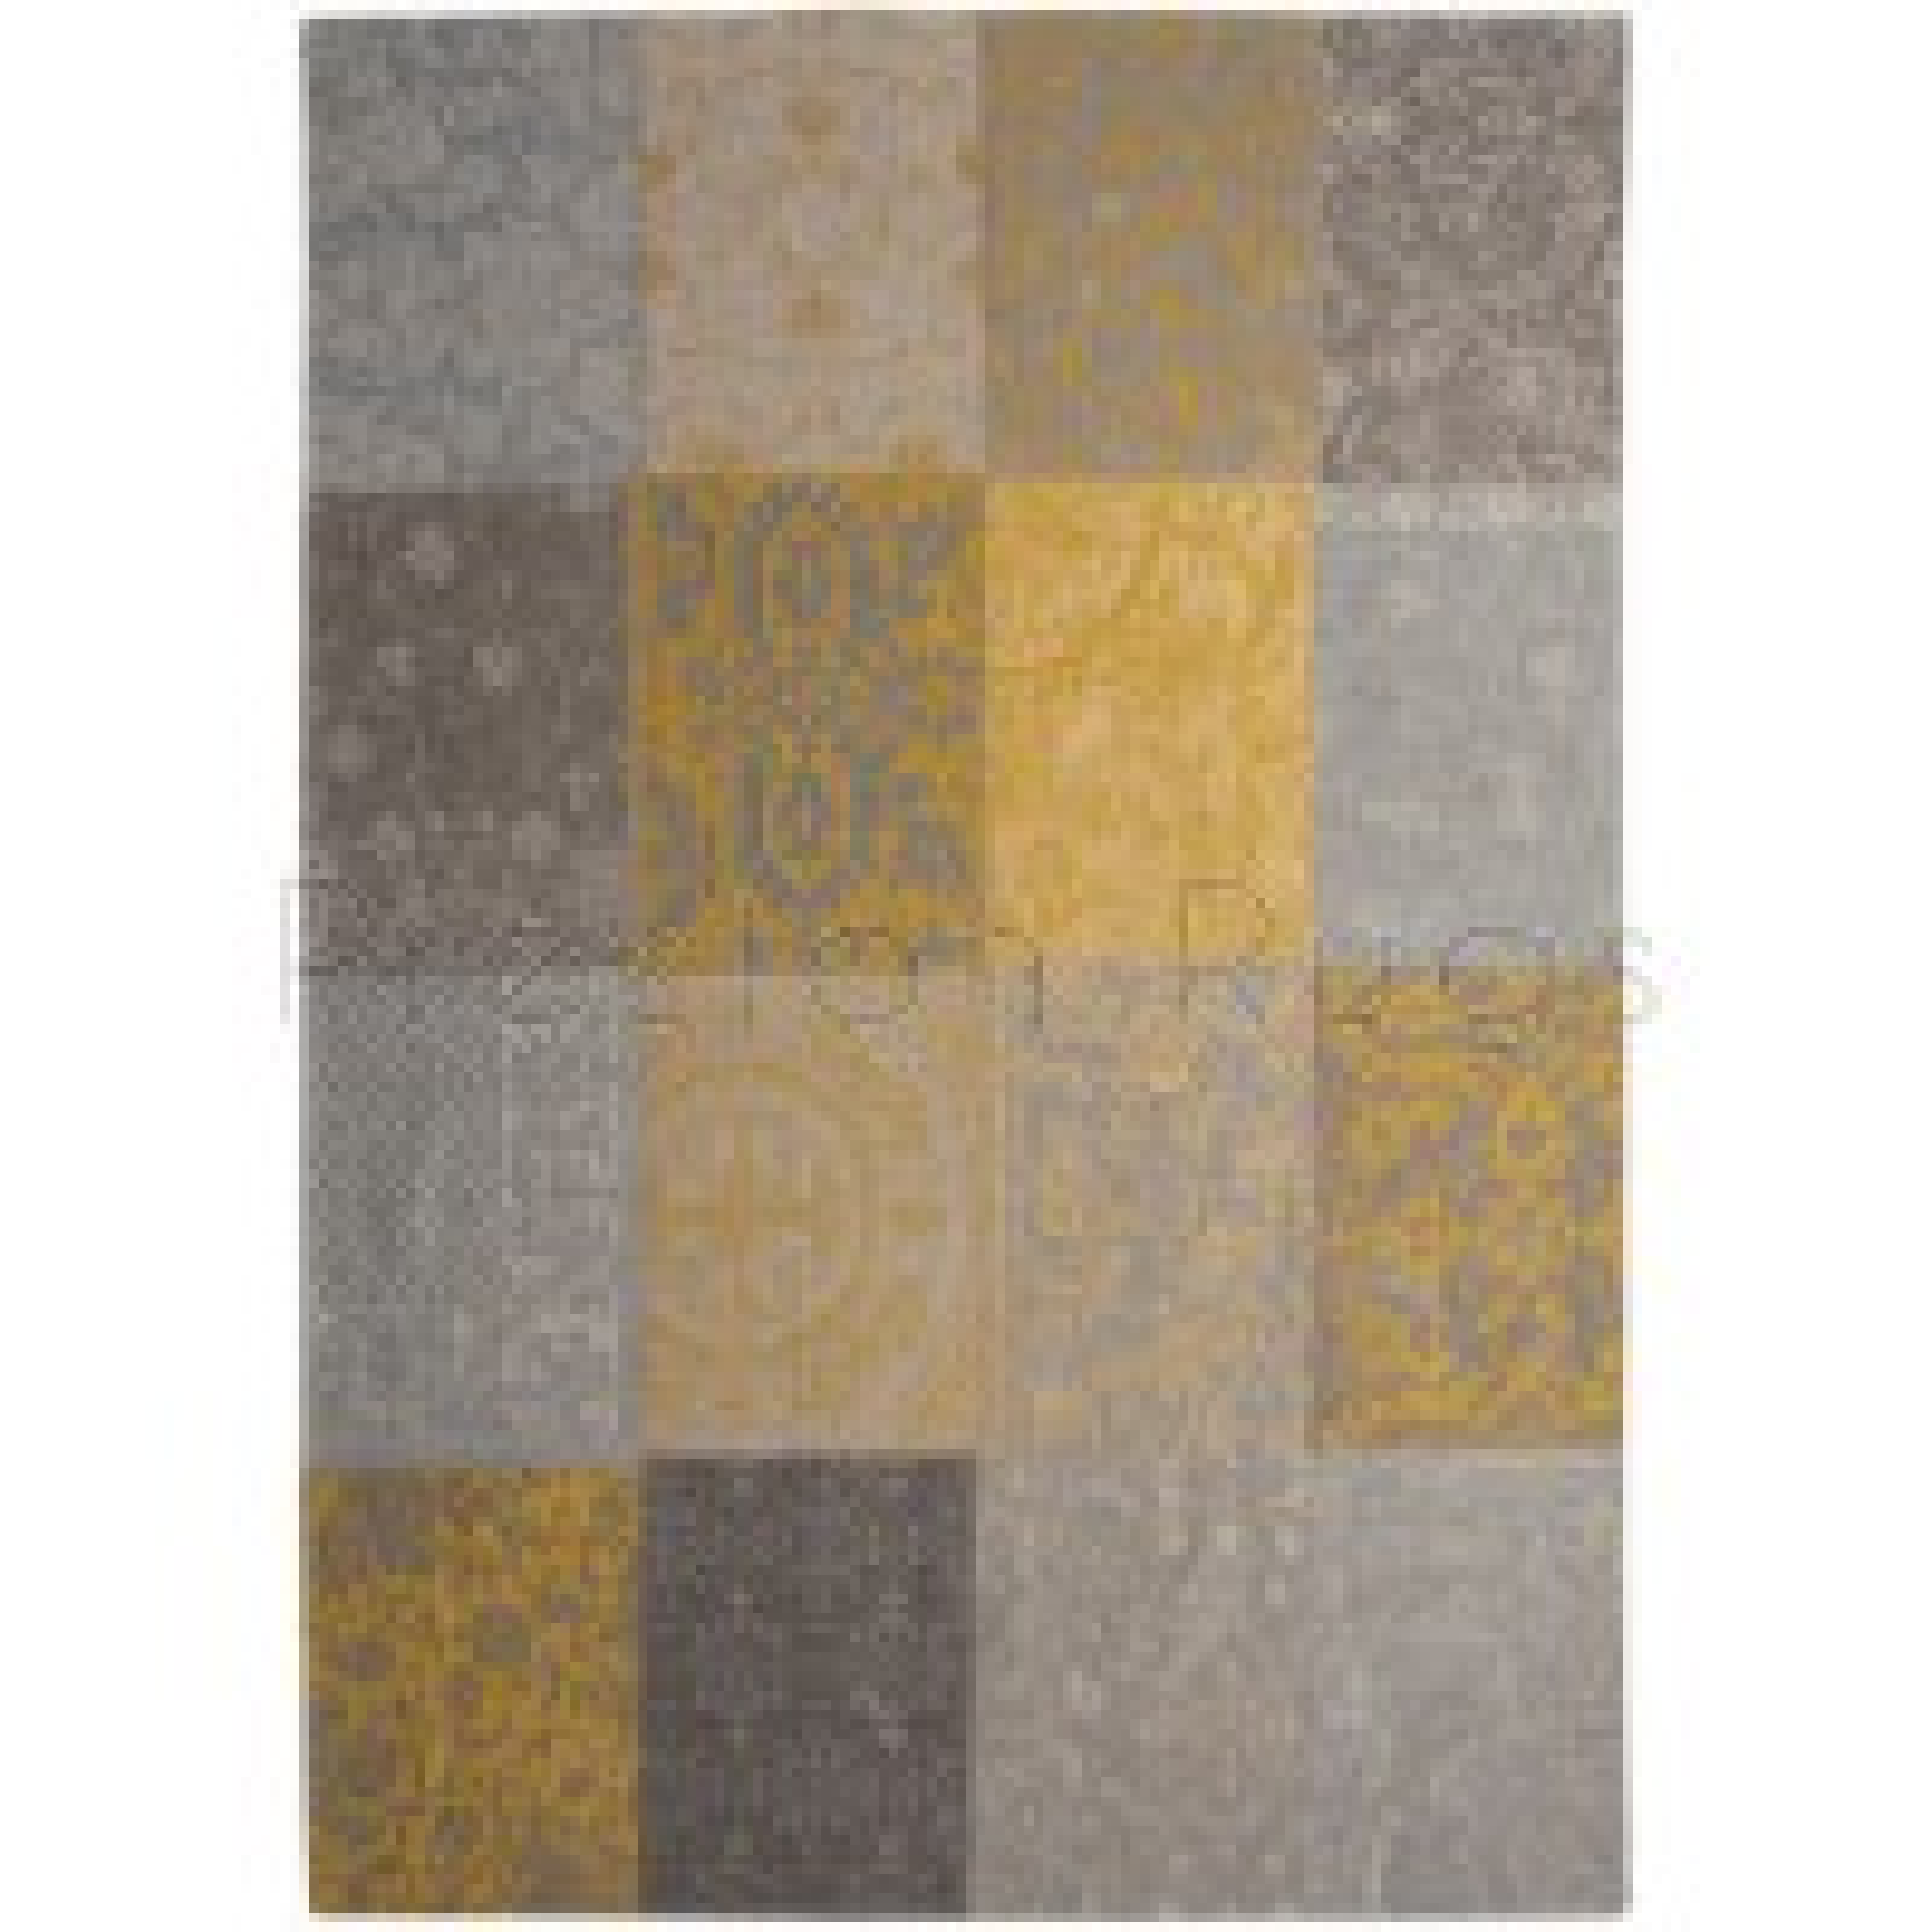 "New Vintage Yellow 8084 Rug by Louis de Poortere-200 x 280 cm (6'7"" x 9'2"")"